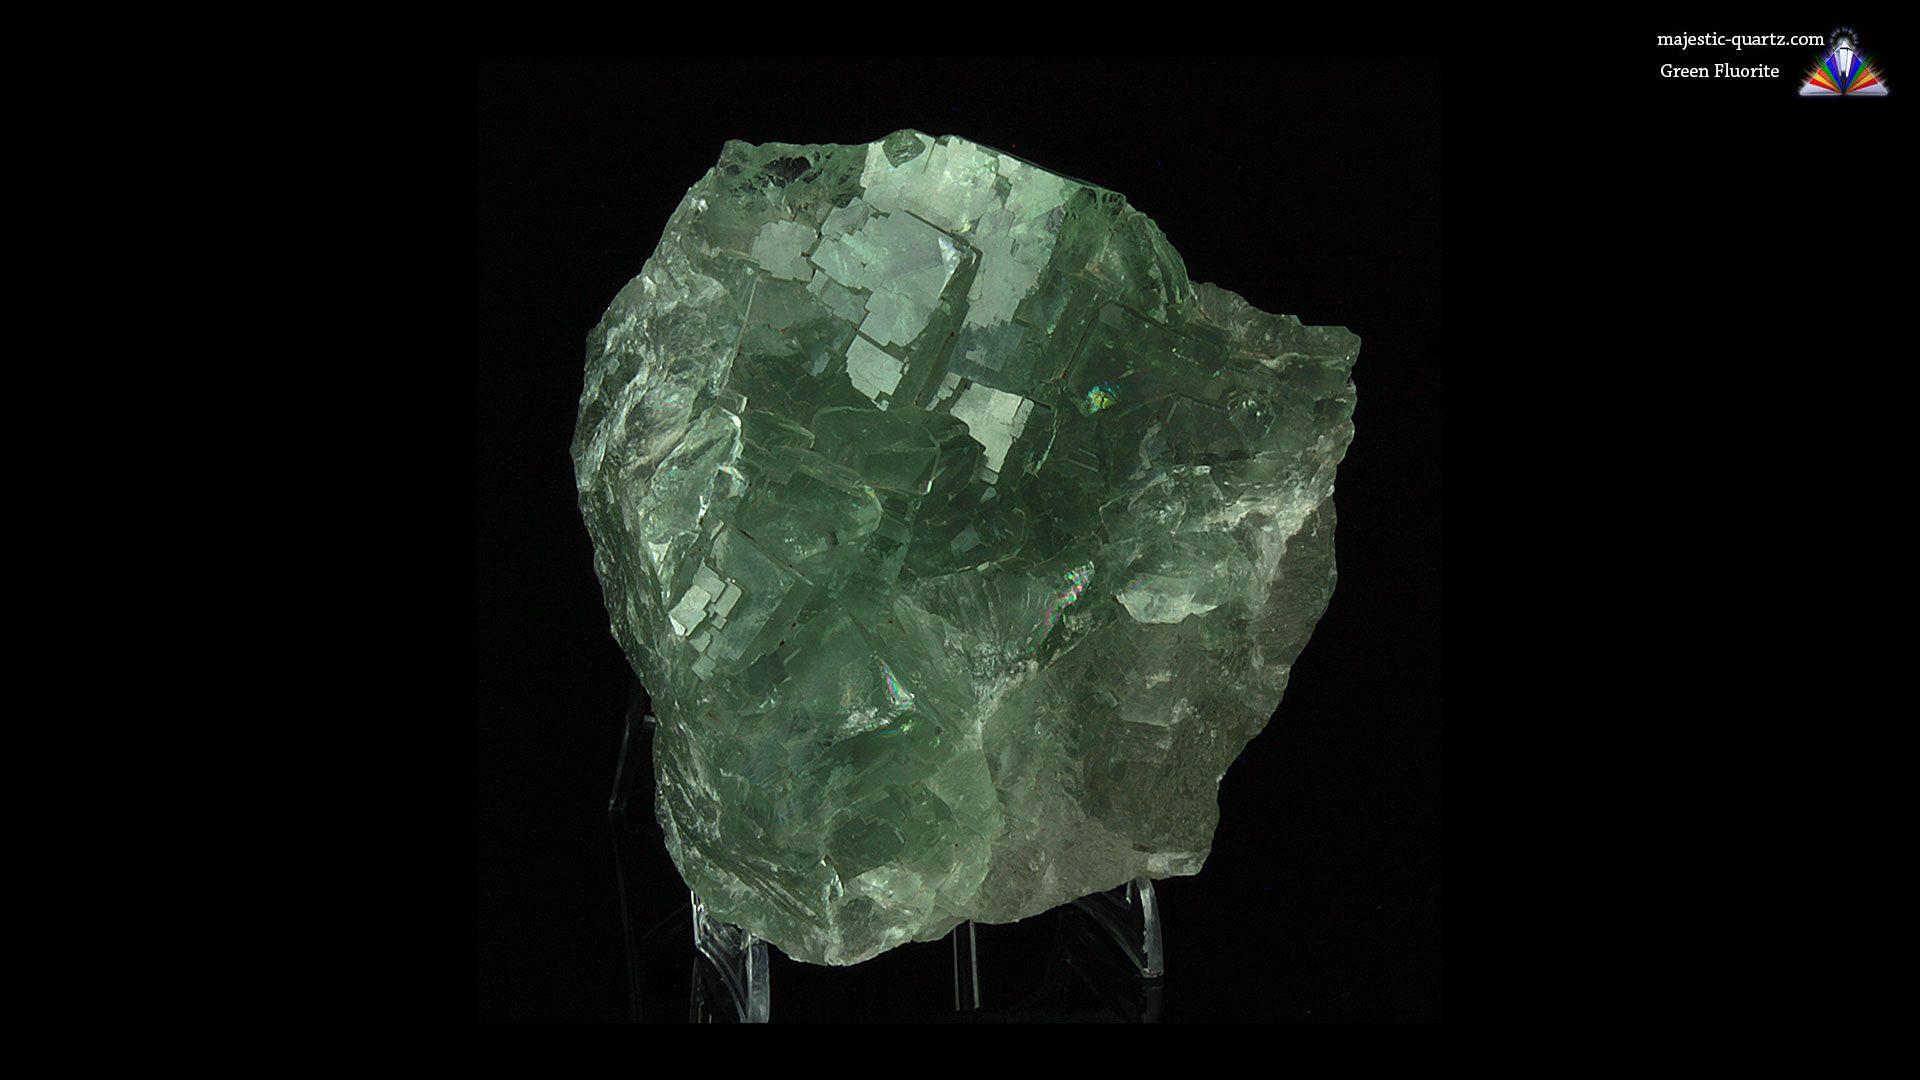 Green Fluorite Cluster Crystal/Mineral Specimen